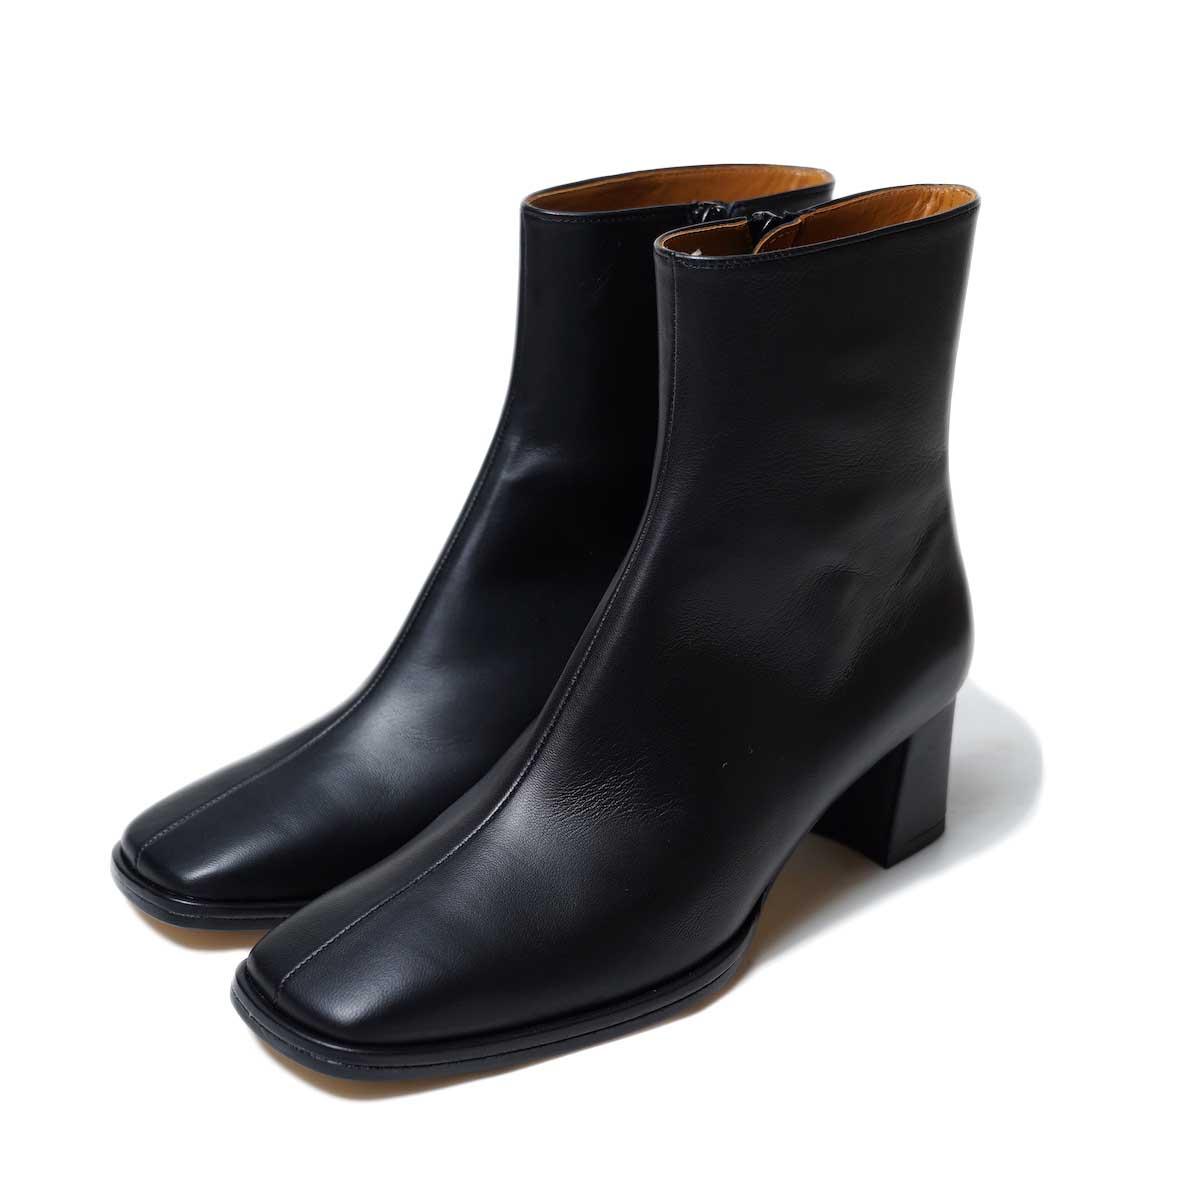 JANESMITH / SQUARE TOE SHORT BOOTS (Black)